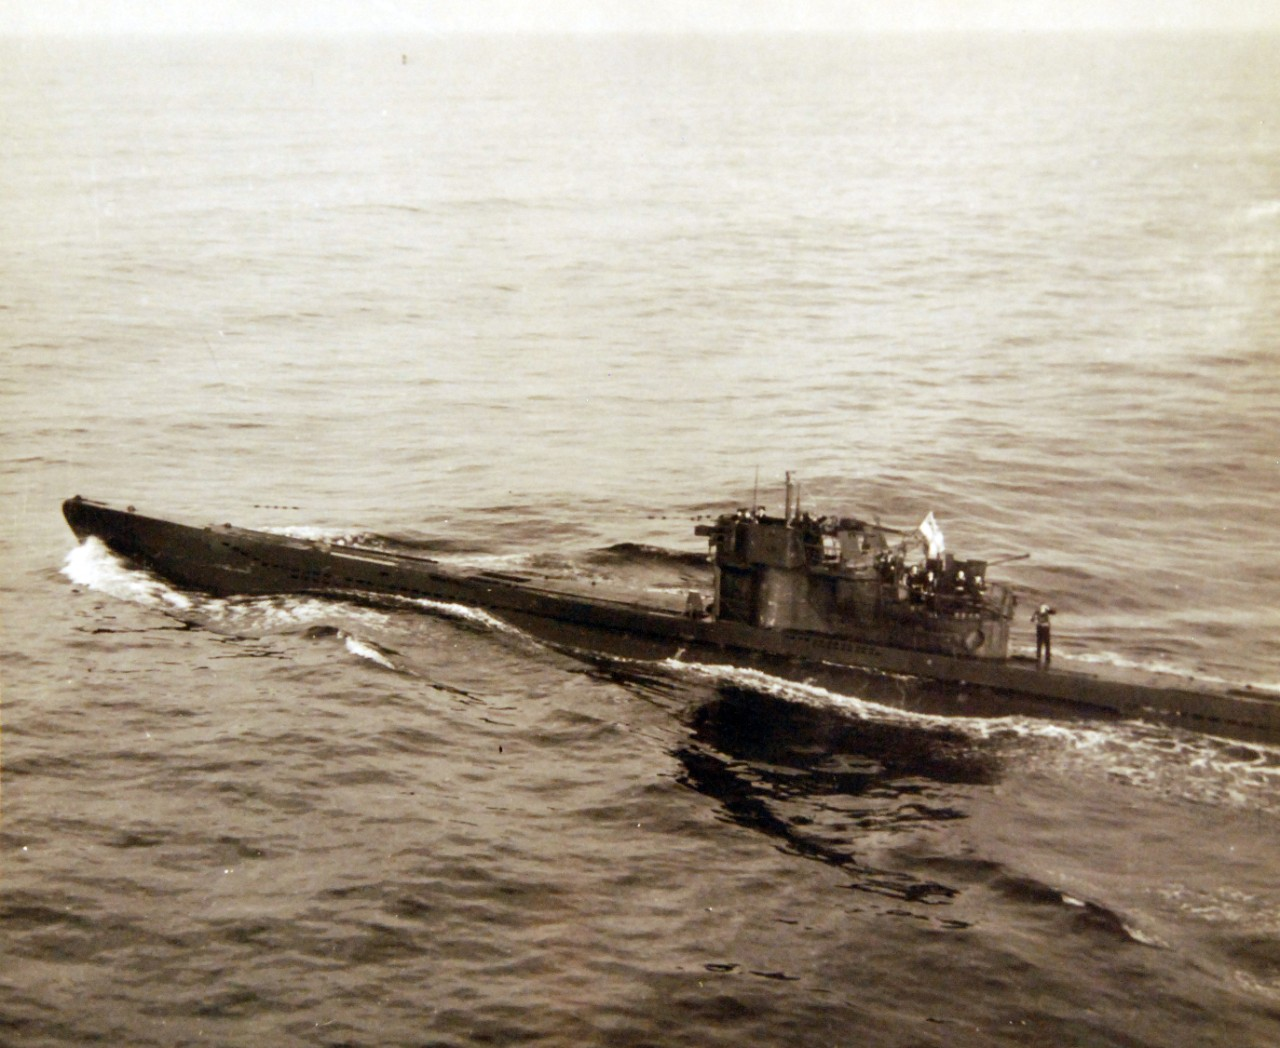 80-G-320287: Surrender of German U-boats, WWII